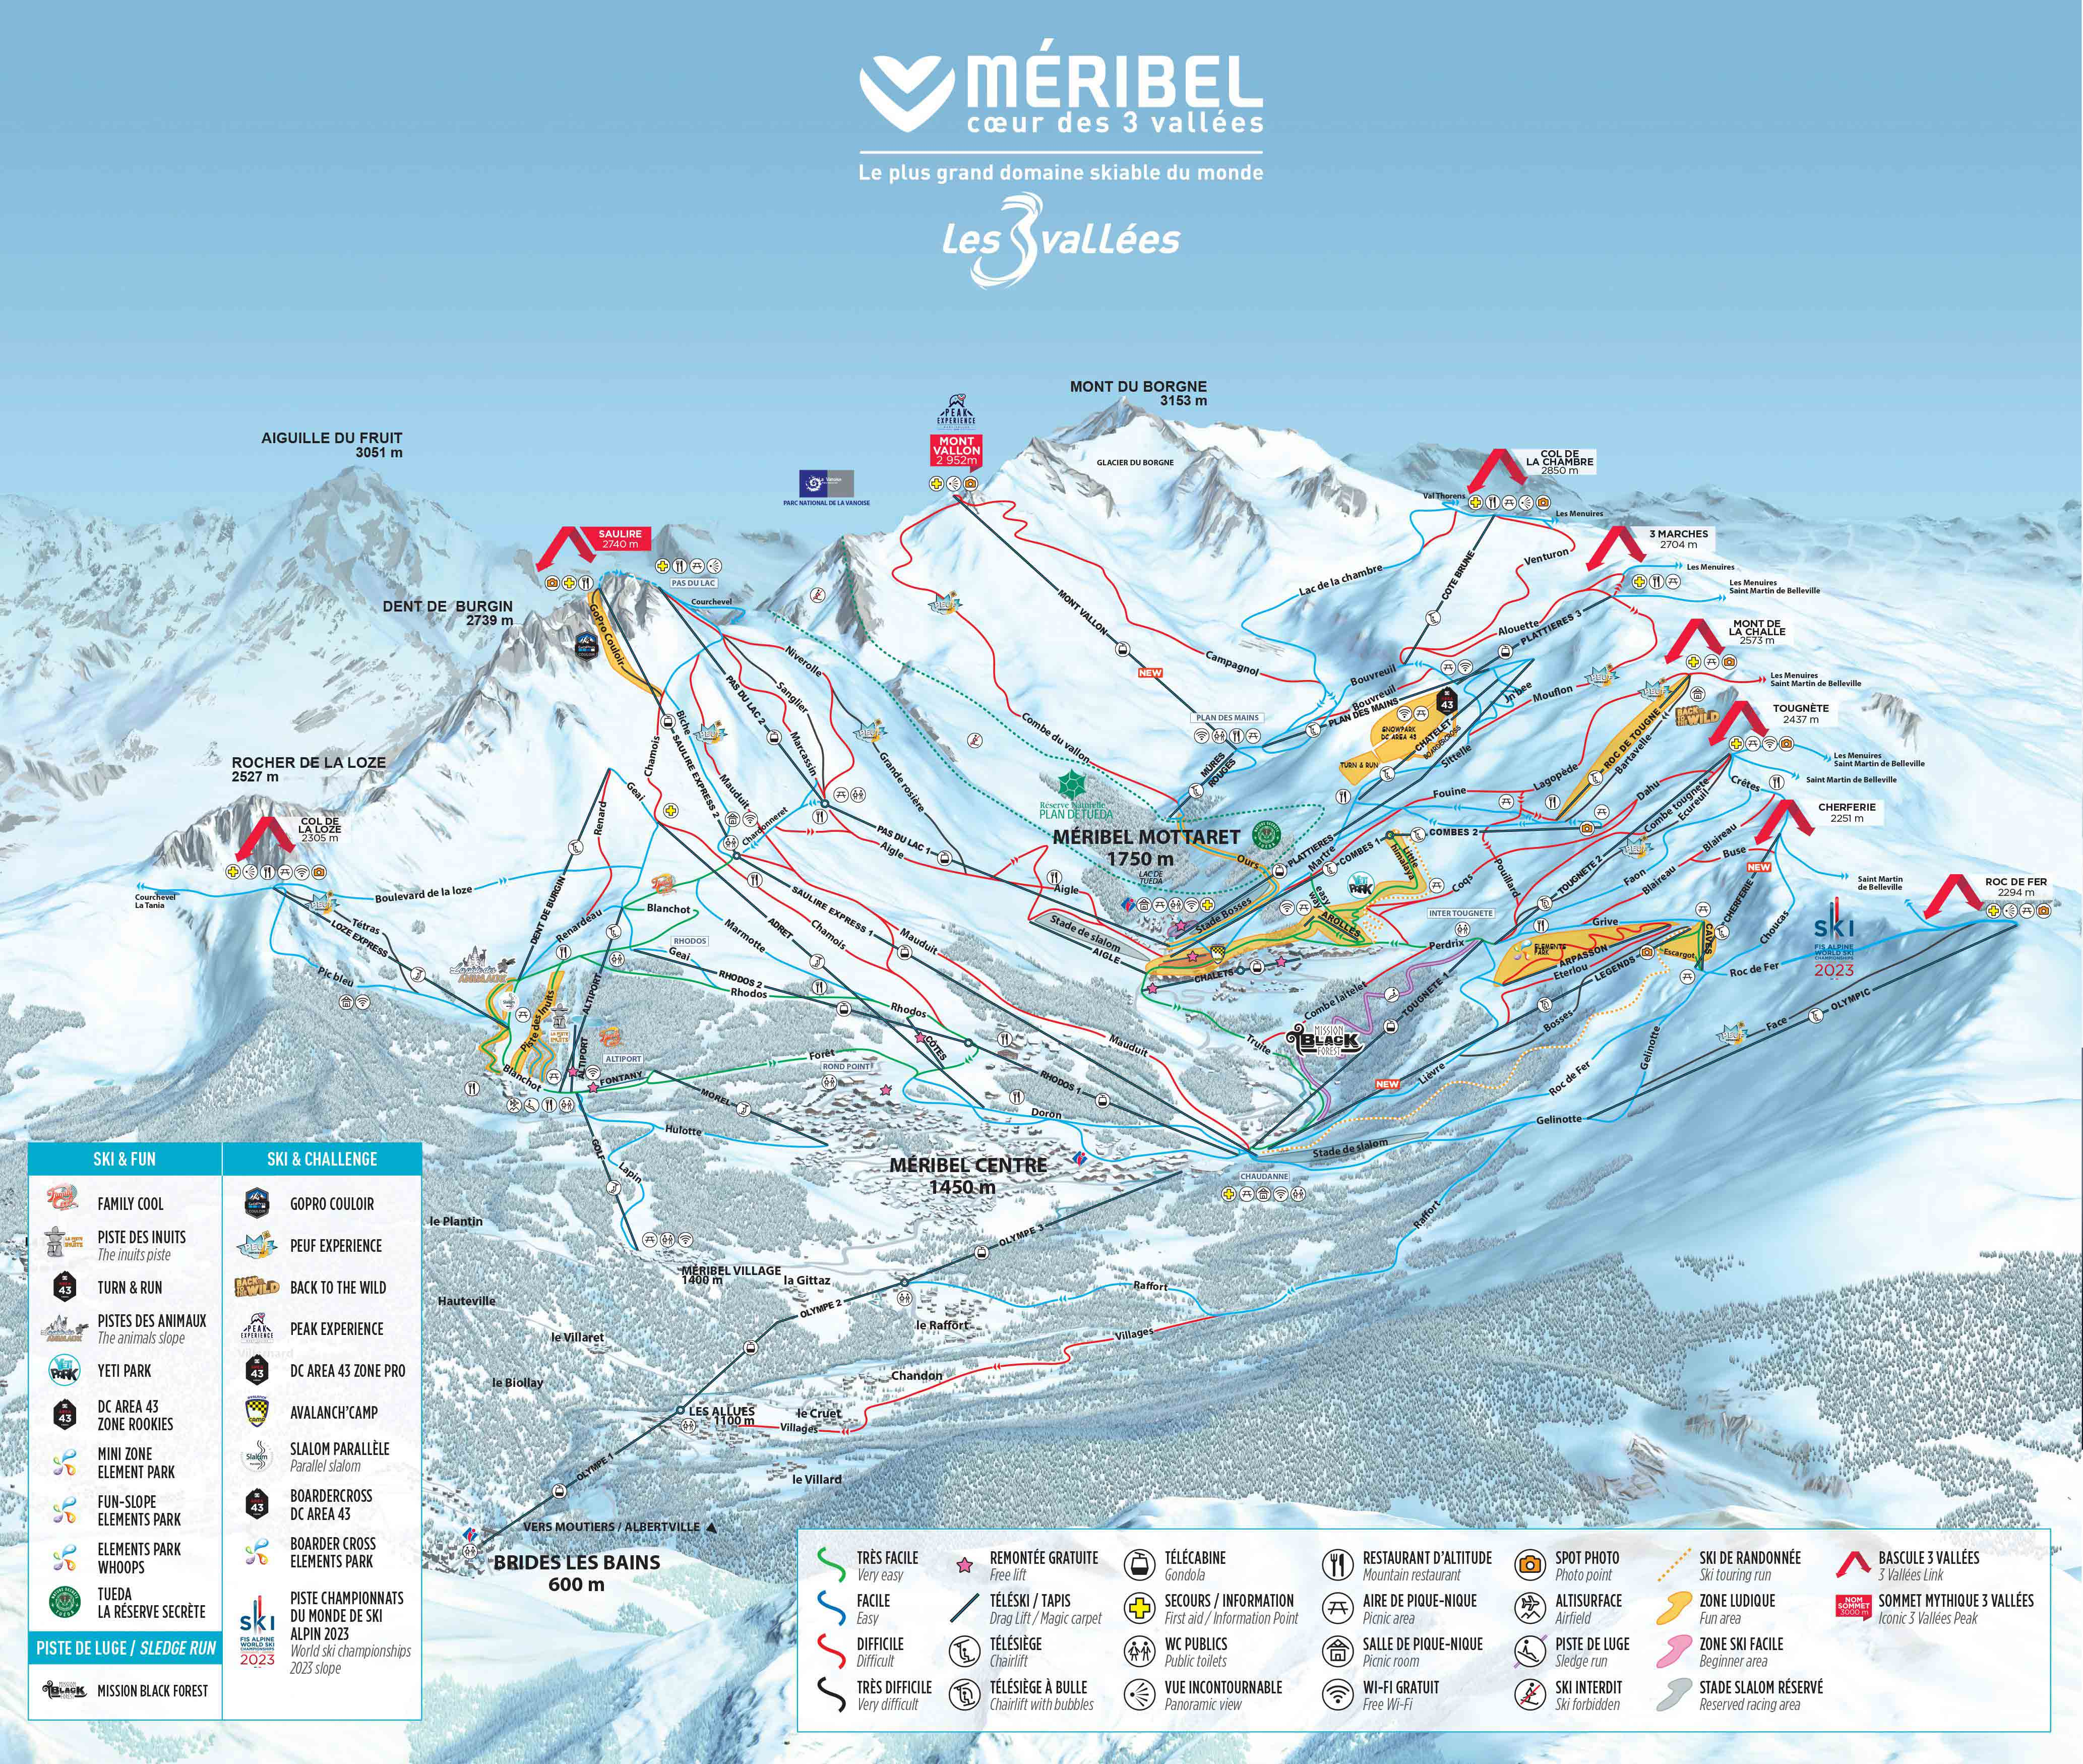 Plan des pistes Méribel et Méribel Mottaret 2018/2019